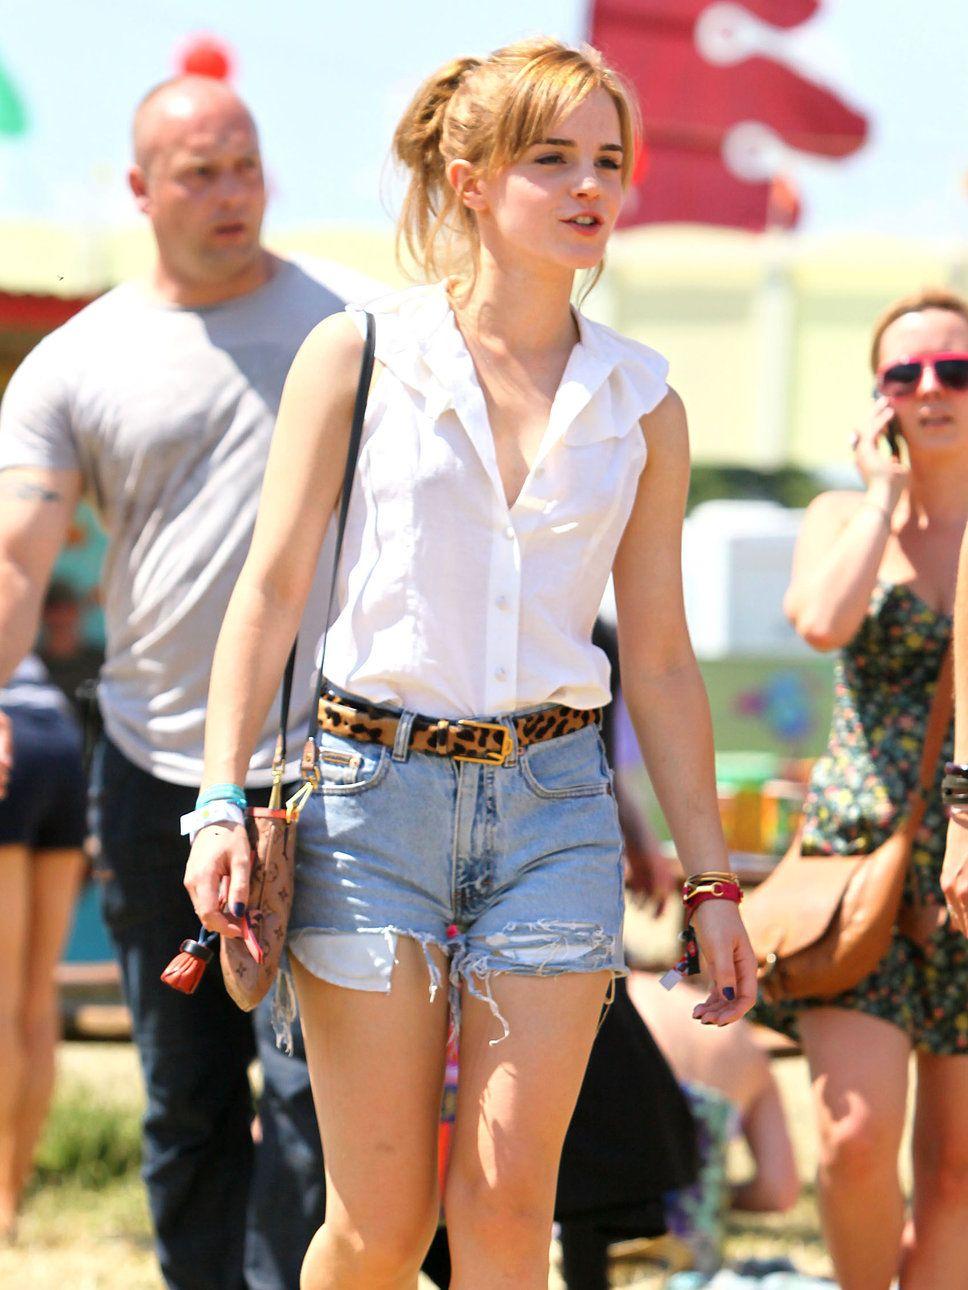 Emma Watson's outfit